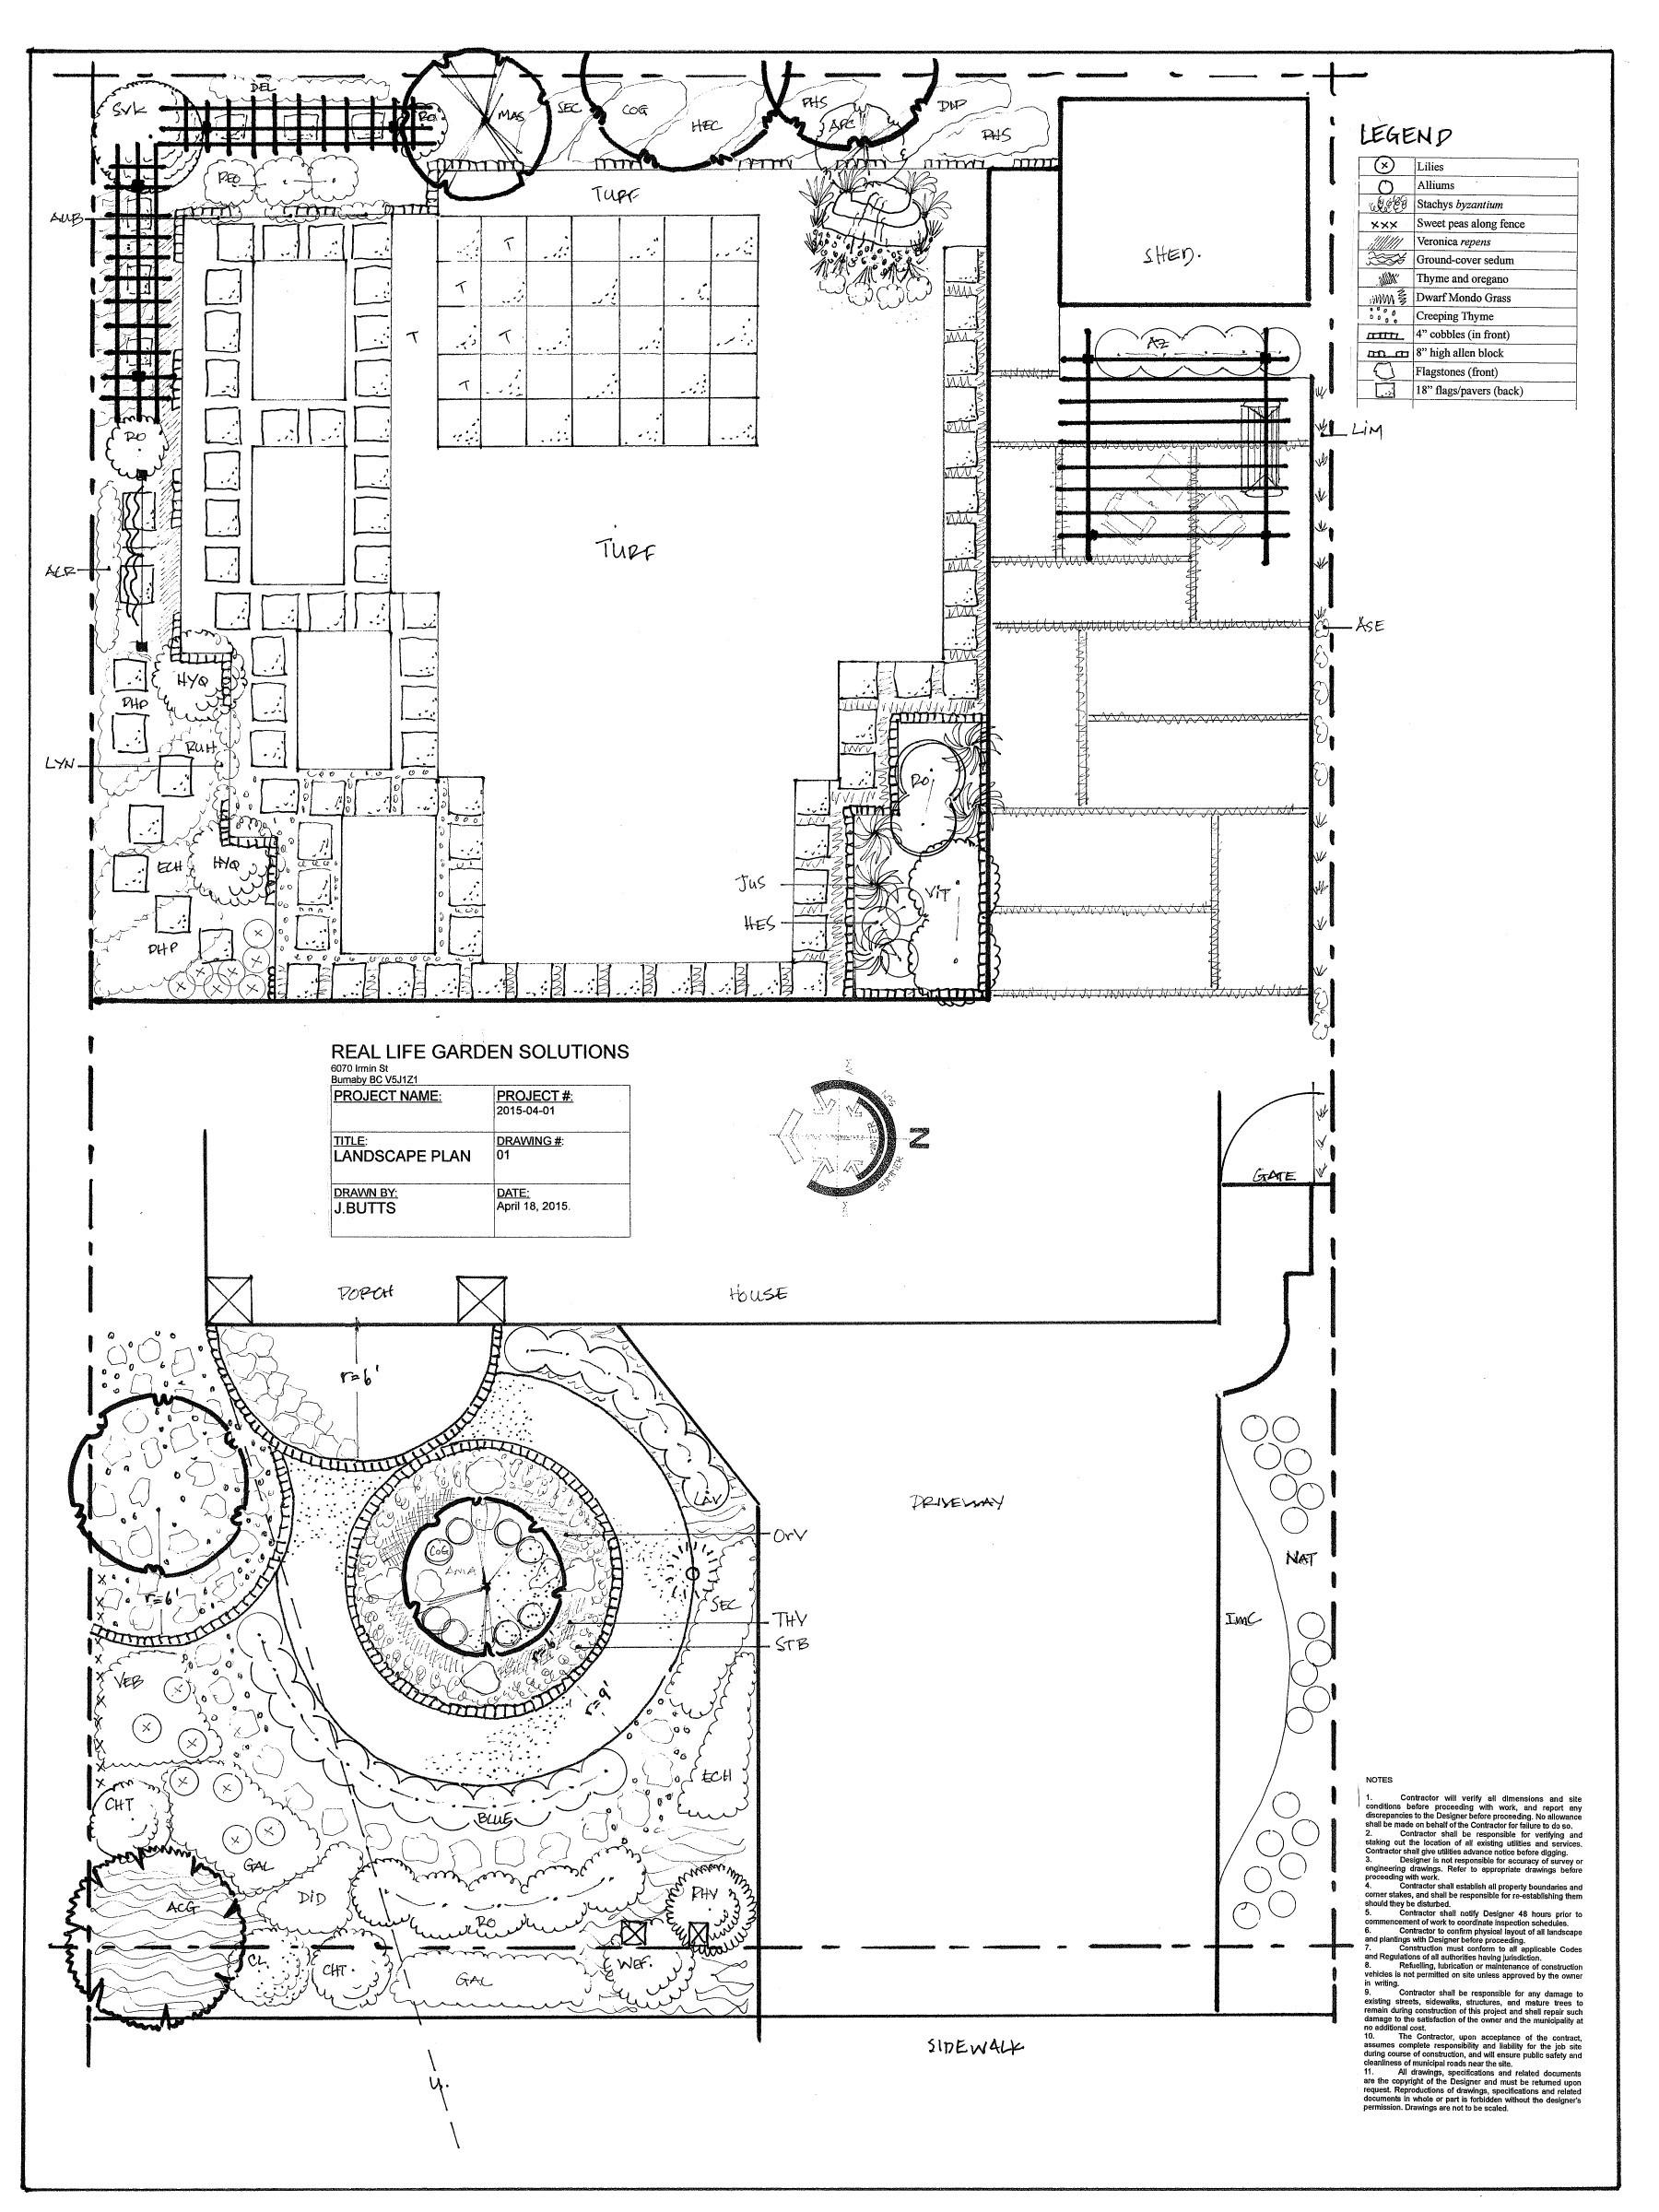 Ithaca Childrens Garden Frank Ryczak — WPDevil